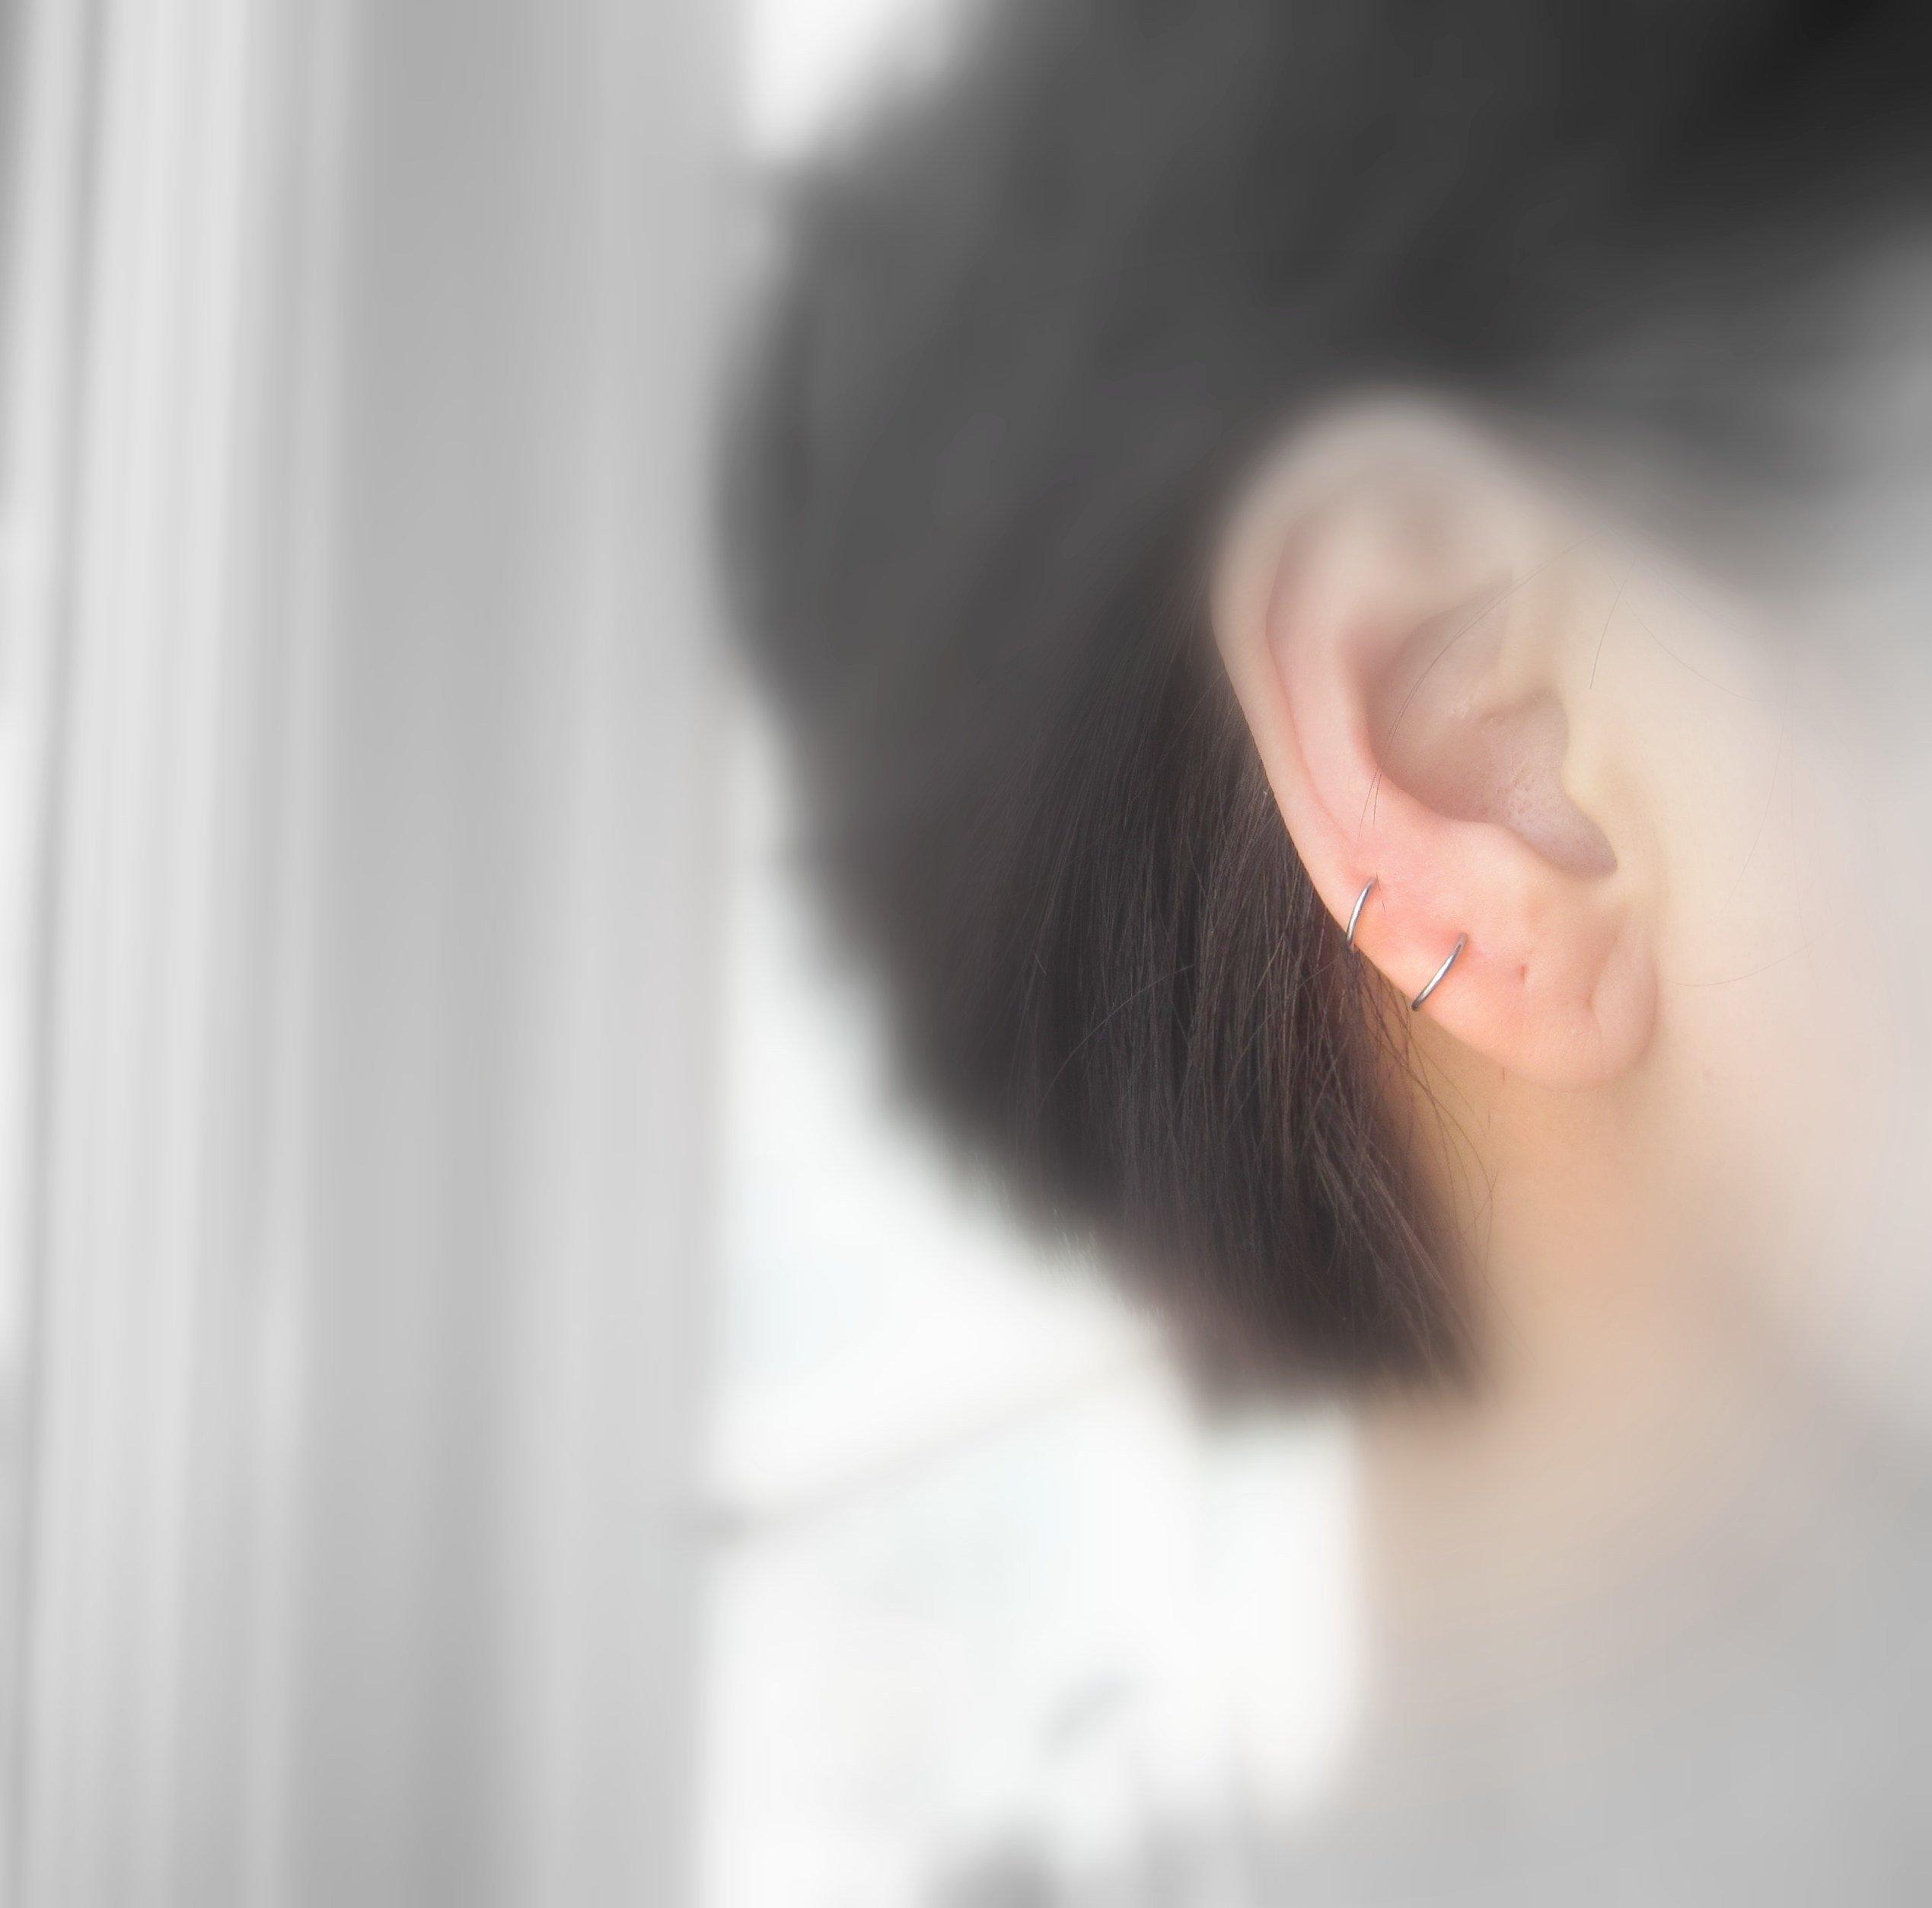 Platinum Small Hoop Earrings for Sensitive Ear Lobe Cartilage Handmade One Pair 20G 8mm